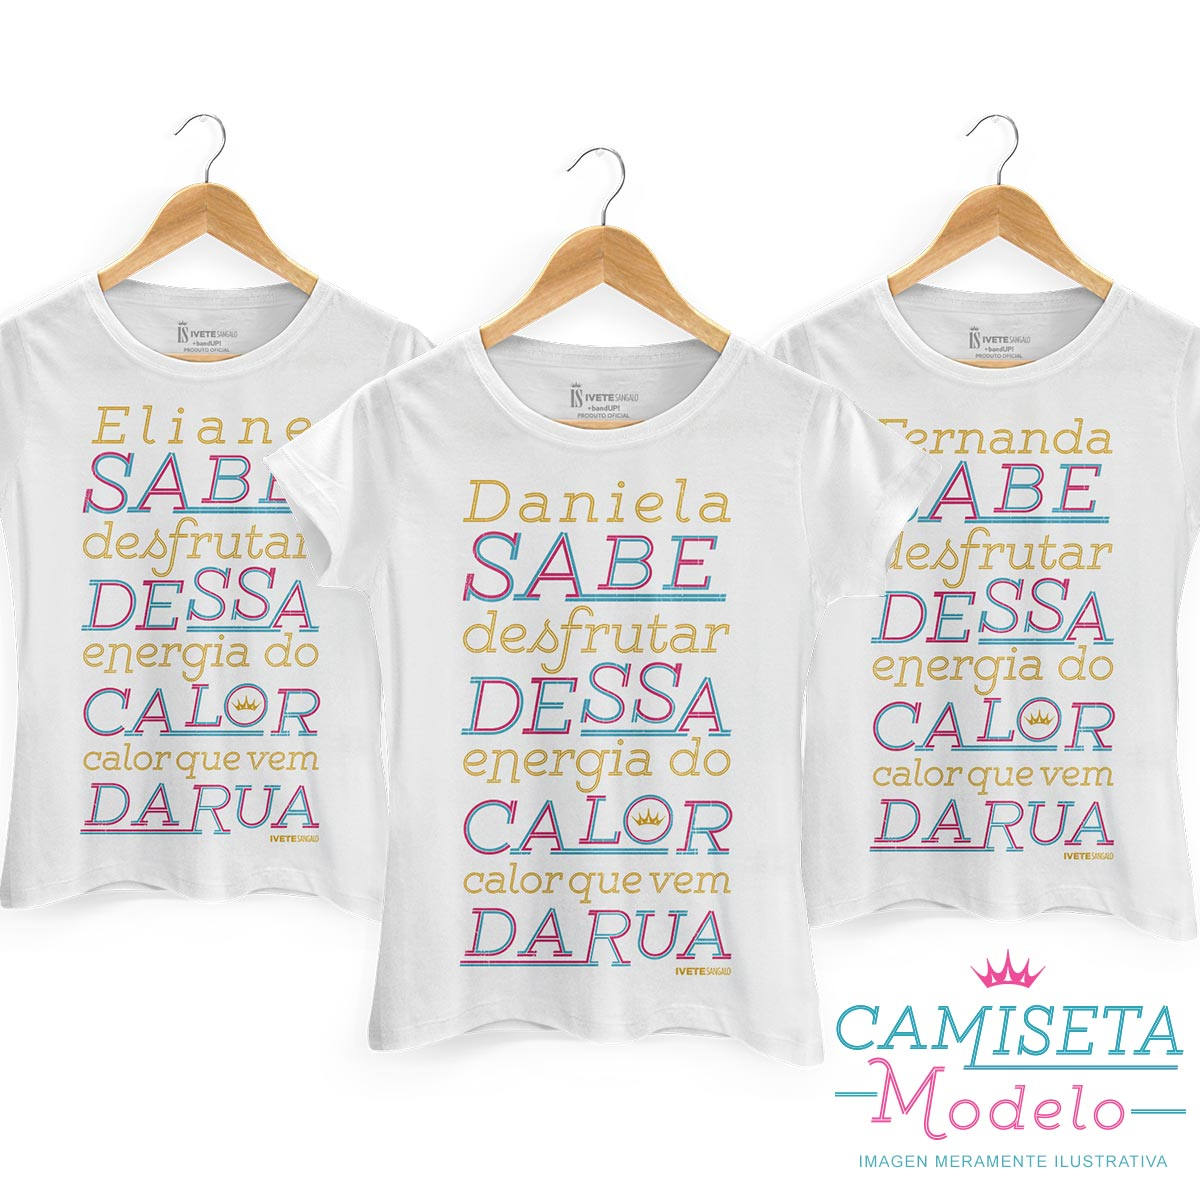 Camiseta Feminina Ivete Sangalo Calor Que Vem da Rua Personalizada